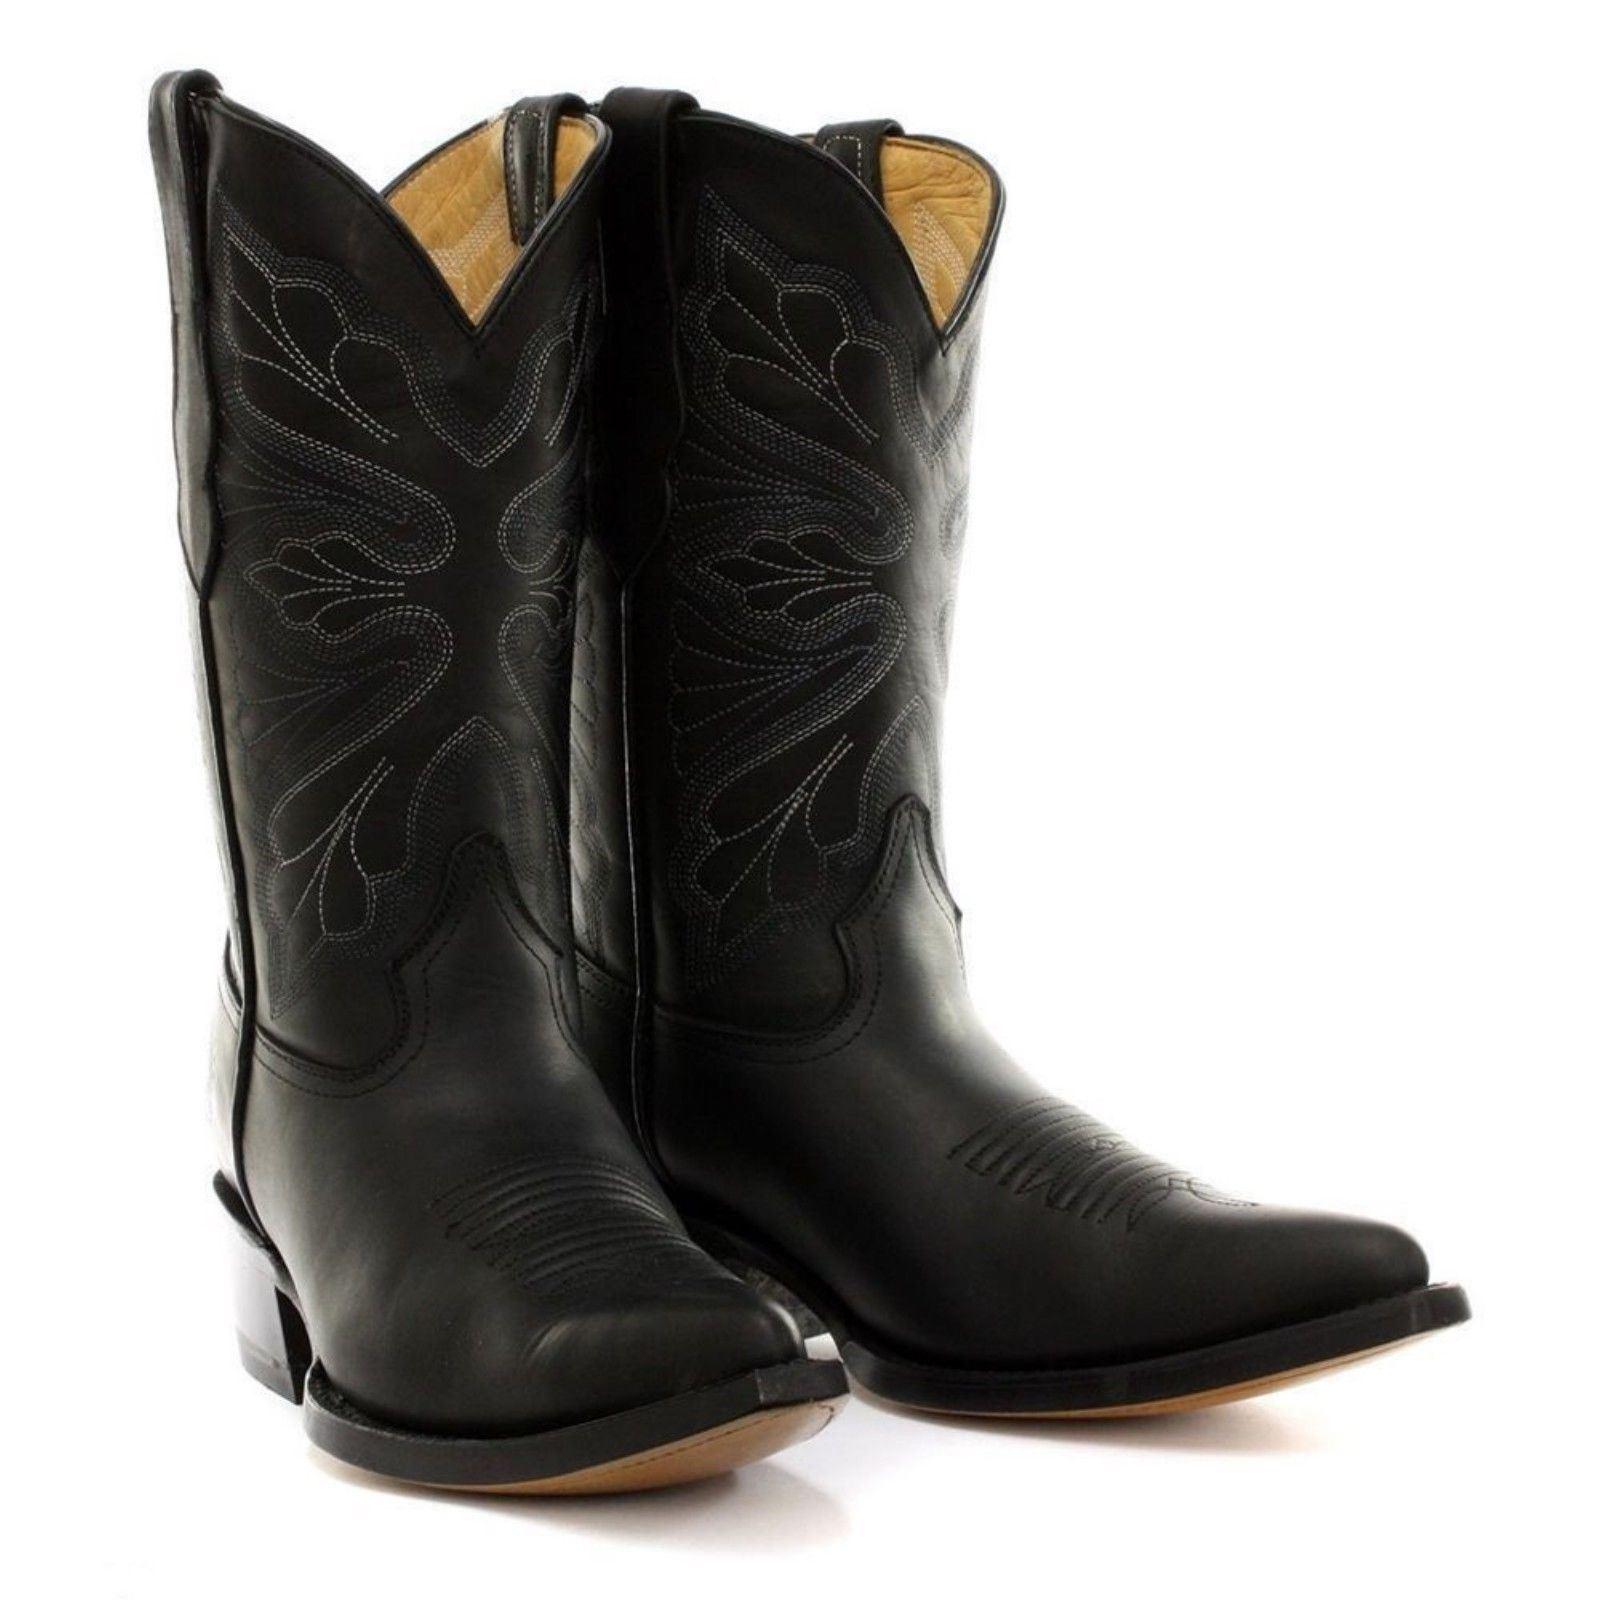 Stivali Cowboy Dallas da pelle Grinders in Grinders Western donna Black 6fwqr68nOx